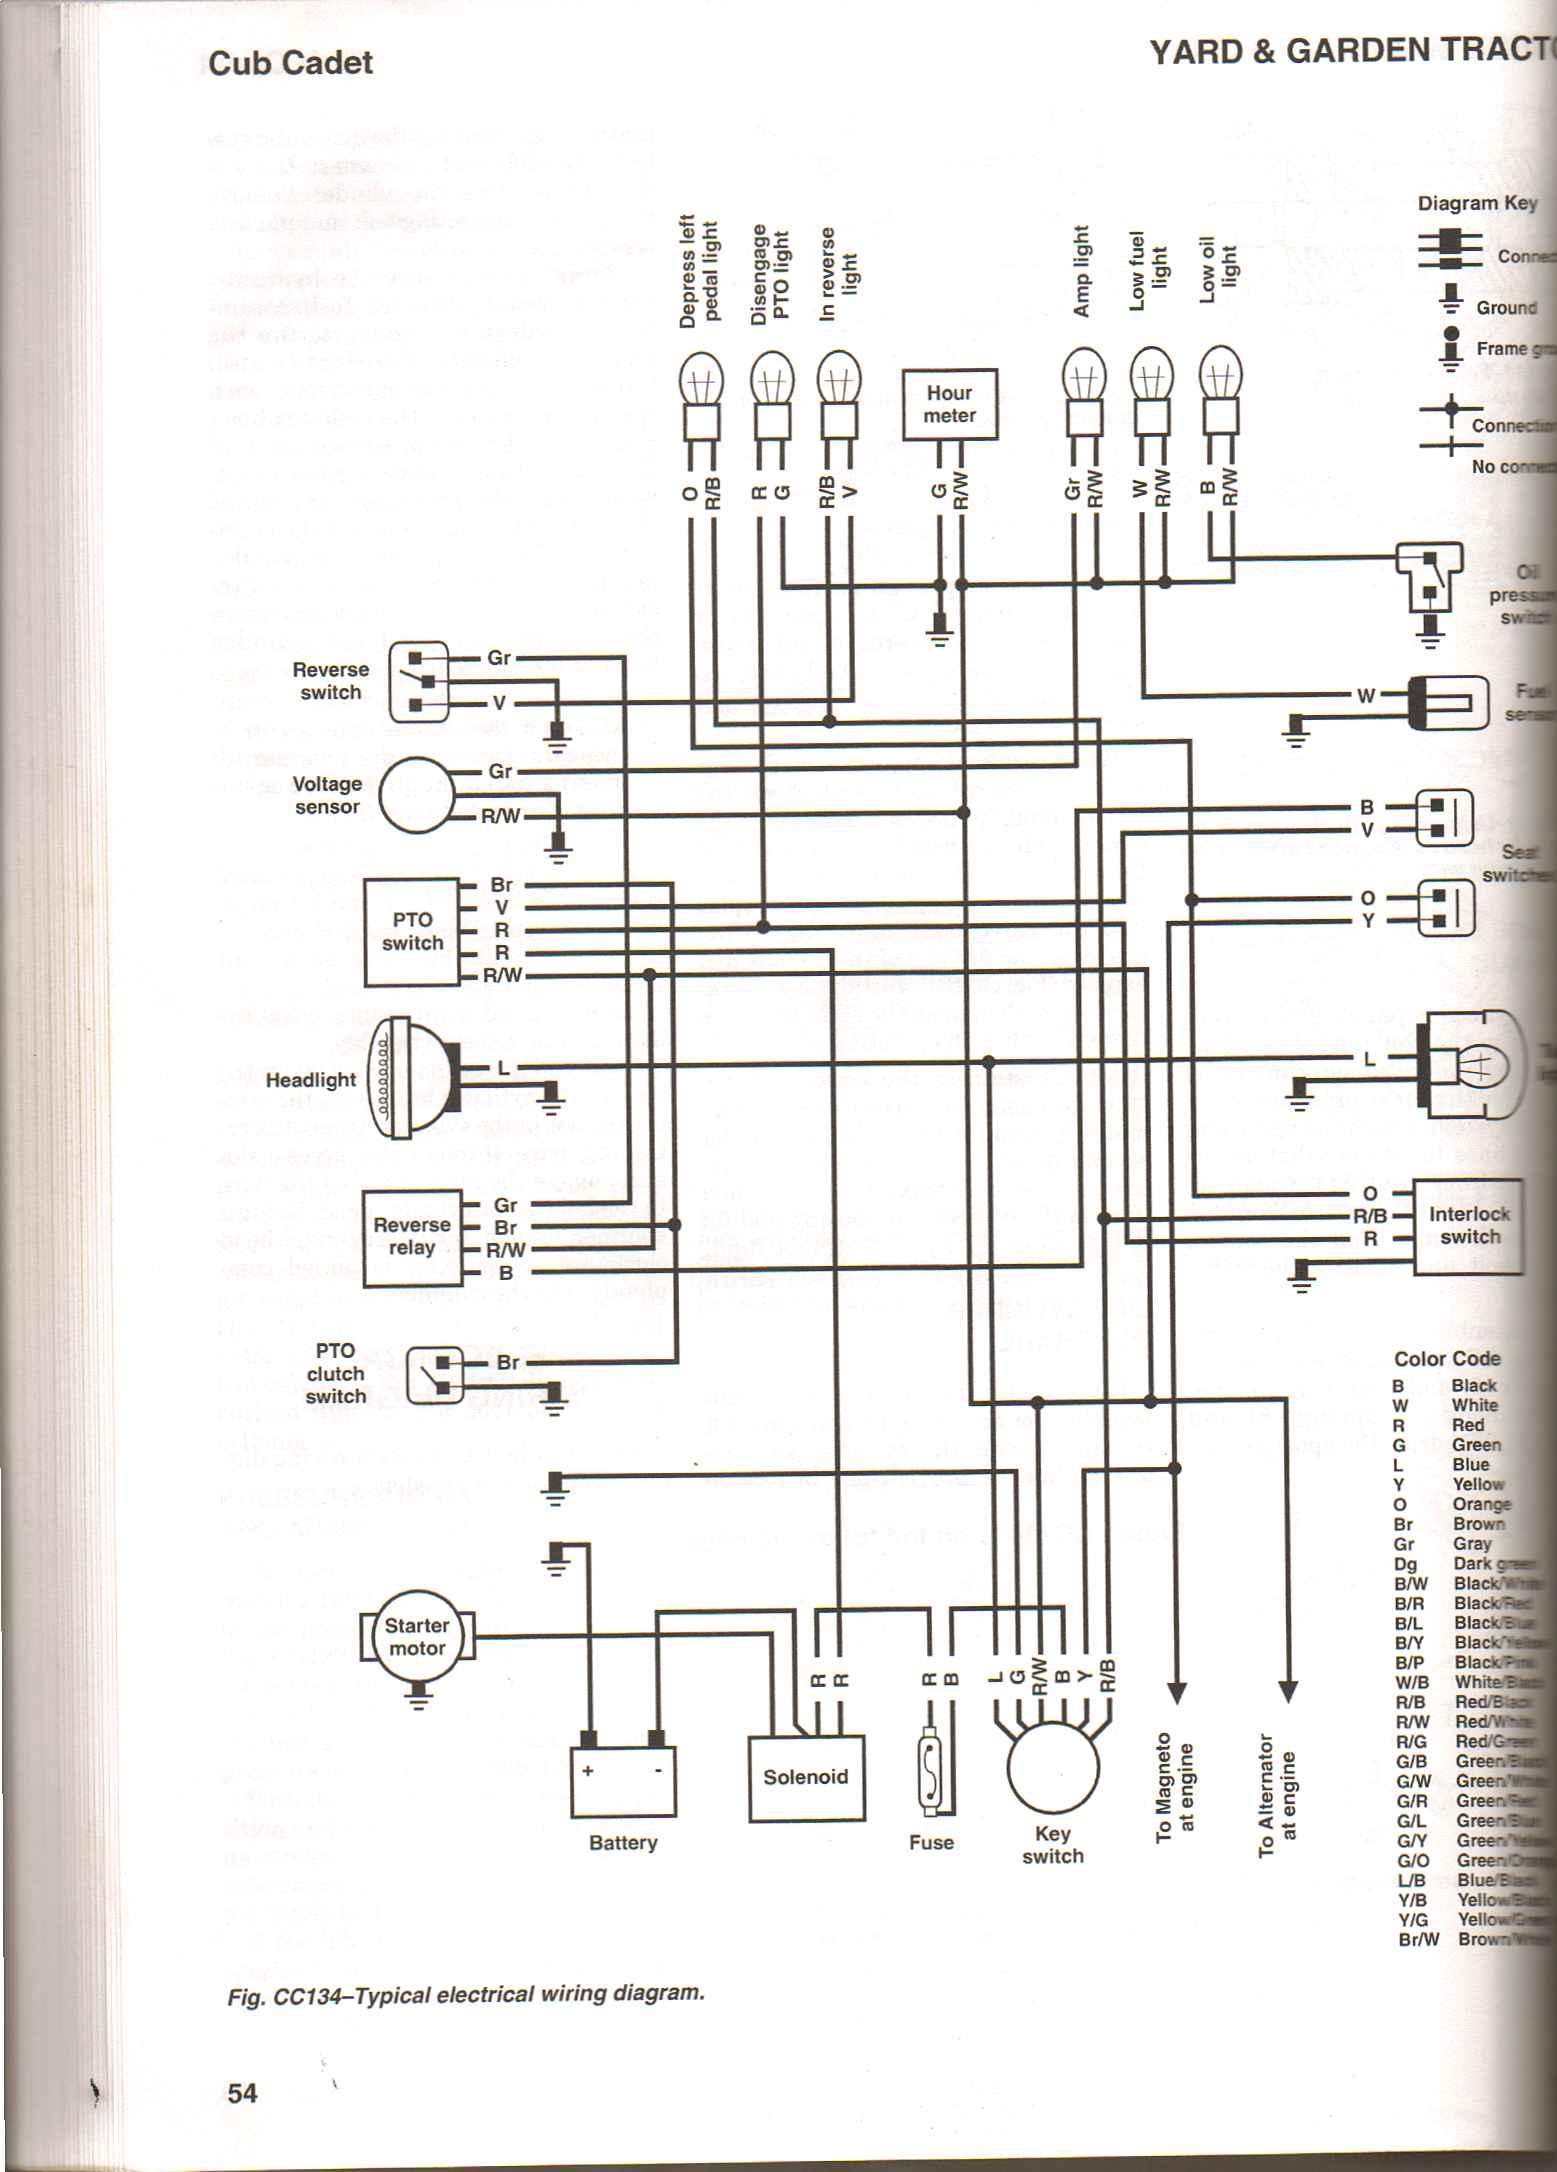 NE_9068] Wiring Diagram Cub Cadet 106 Moreover Cub Cadet Ignition Switch  Wiring Free DiagramOpogo Subd Amenti Capem Mohammedshrine Librar Wiring 101